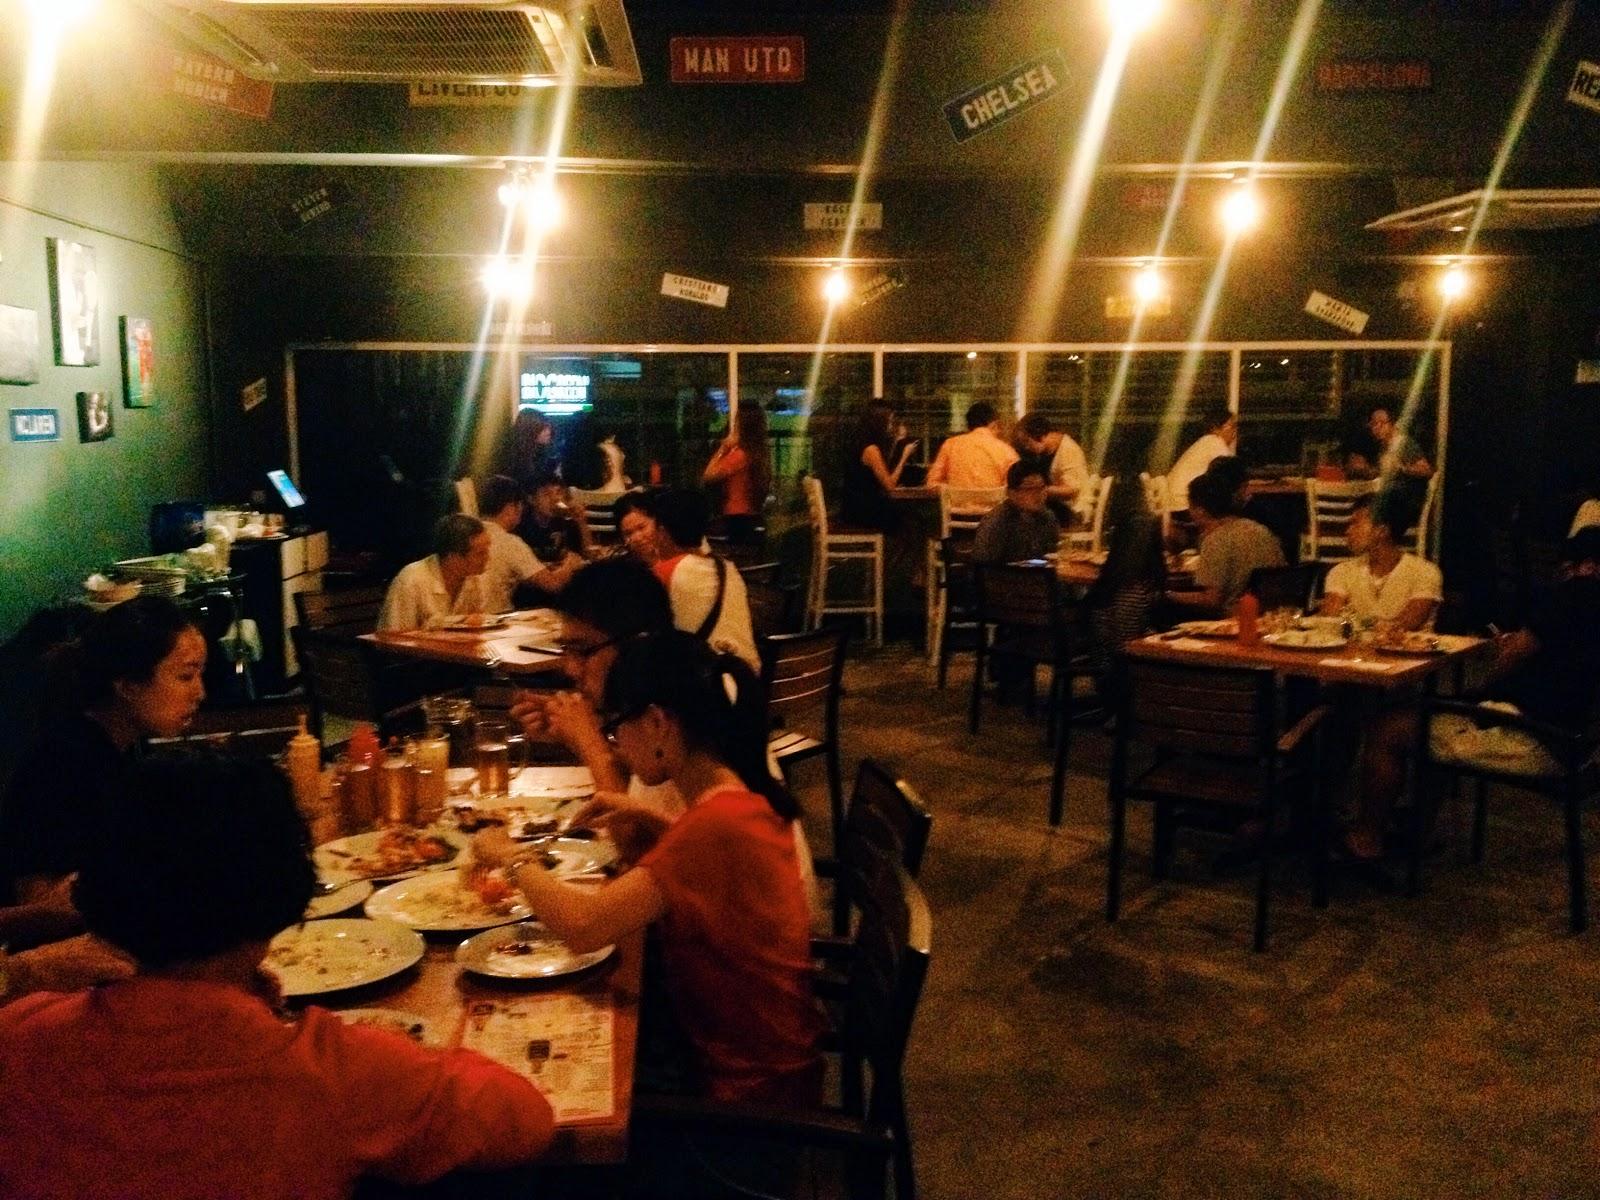 Bob's Kitchen @ Danga Utama, Johor Bahru, Johor, Malaysia